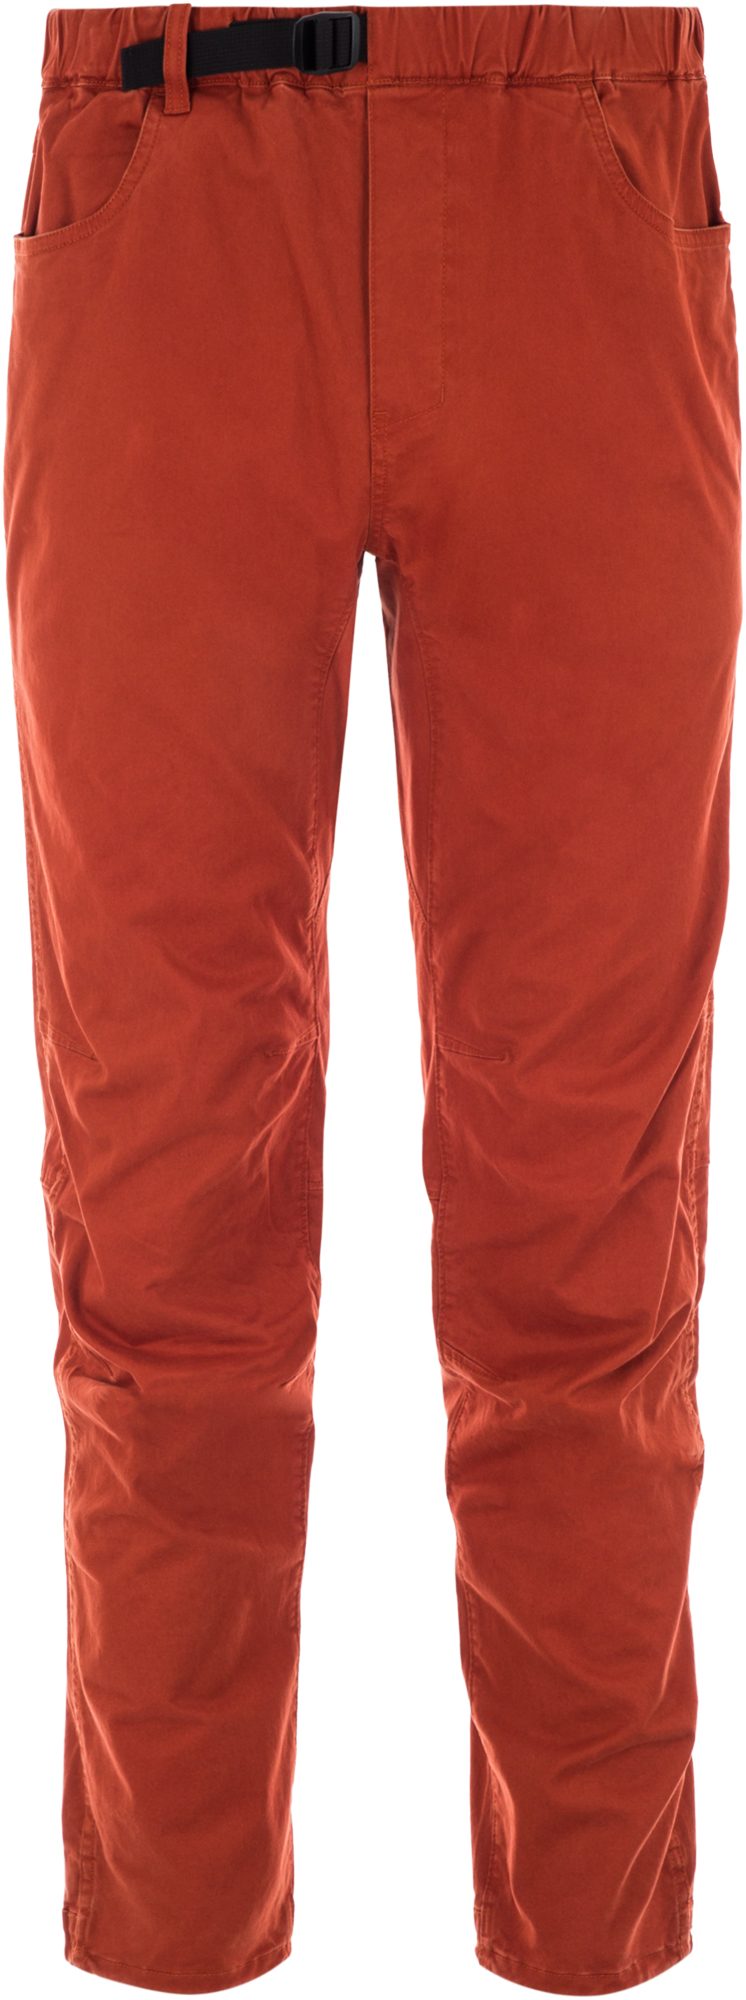 Mountain Hardwear Брюки мужские Mountain Hardwear Cederberg Pull On, размер 50 брюки pull